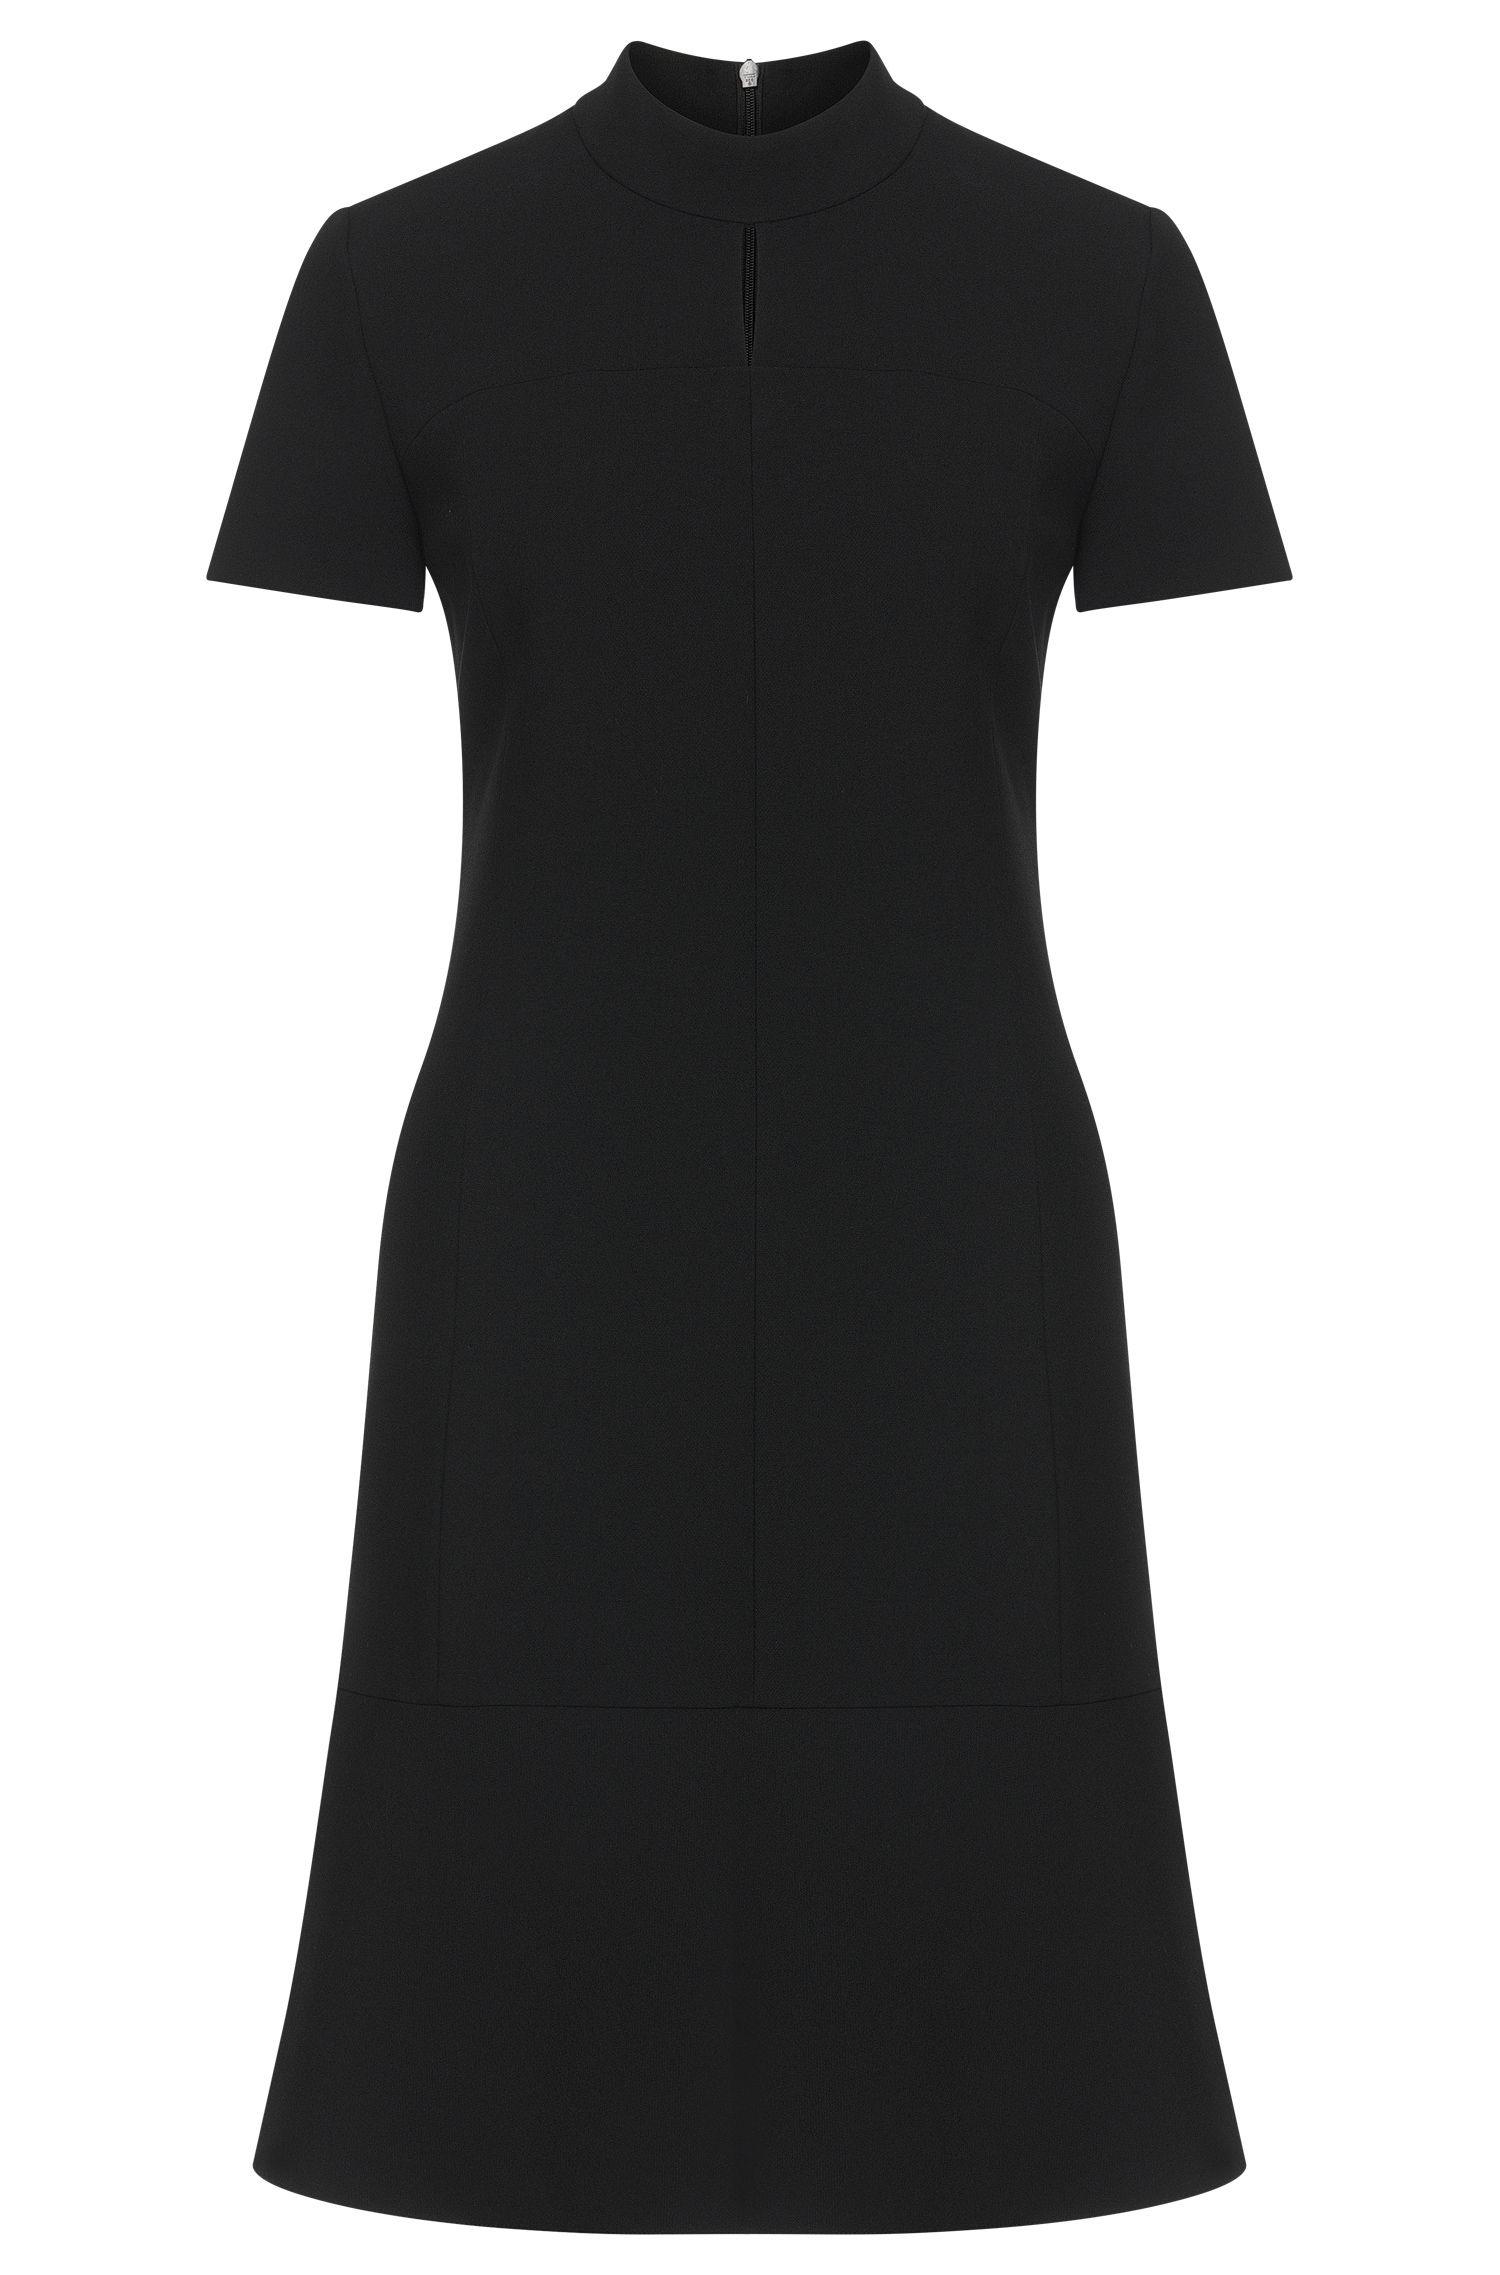 Unifarbenes Kleid mit kurzem Stehkragen: 'Kilona'